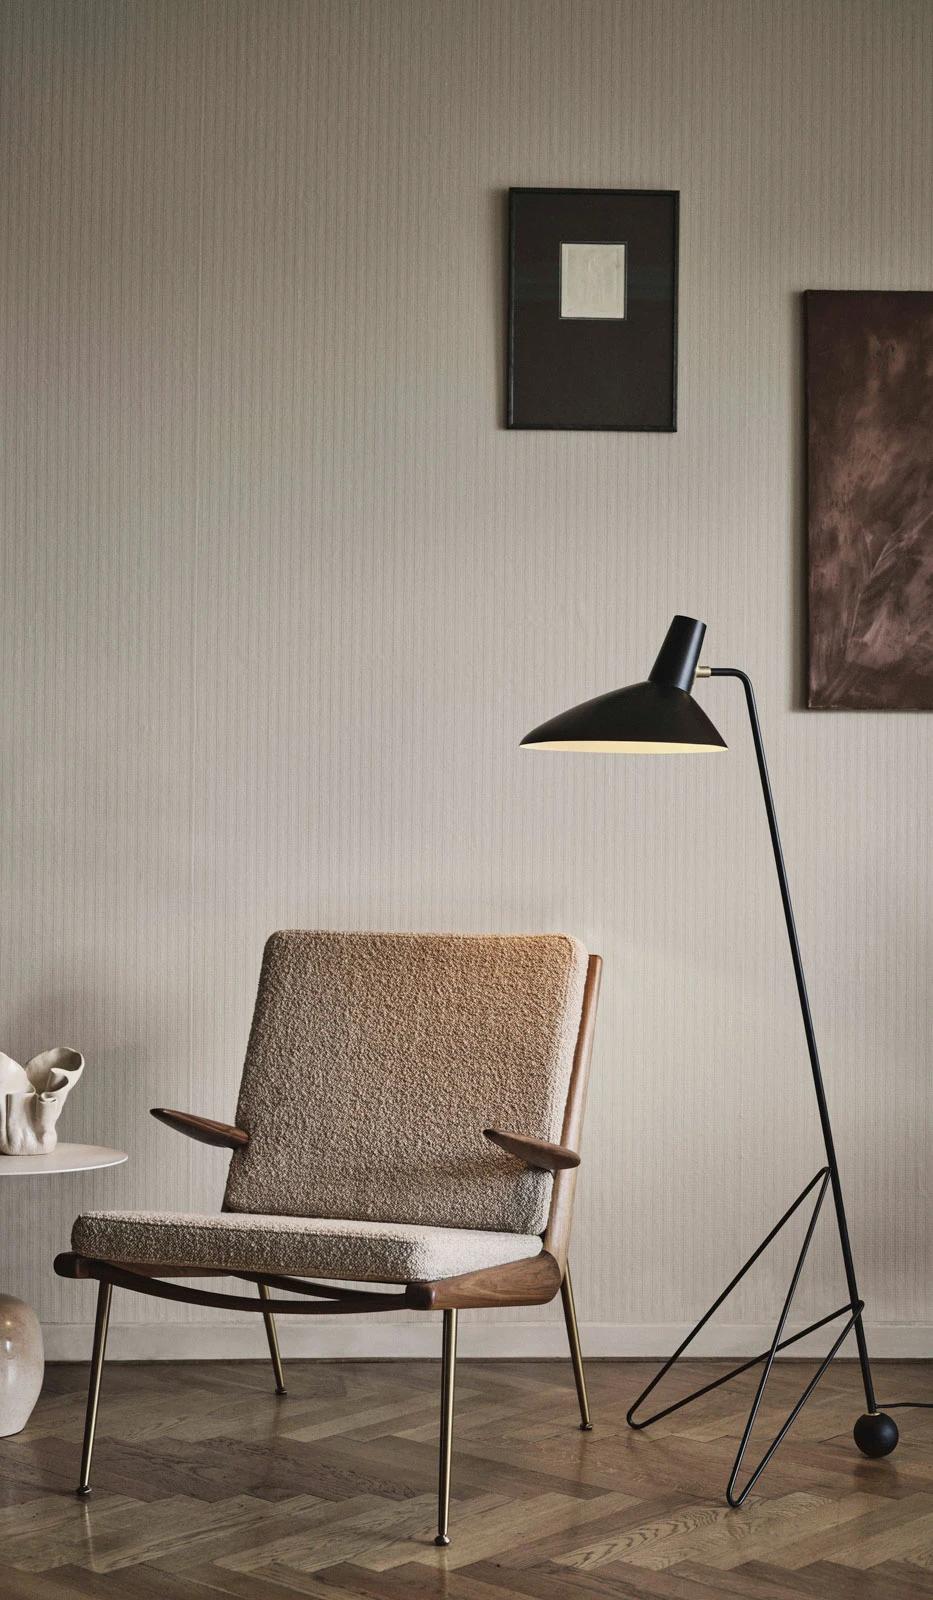 Tradition Hm8 Tripod Floor Lamp Spartan Shop In 2020 Home Decor Contemporary Furniture Design Furniture